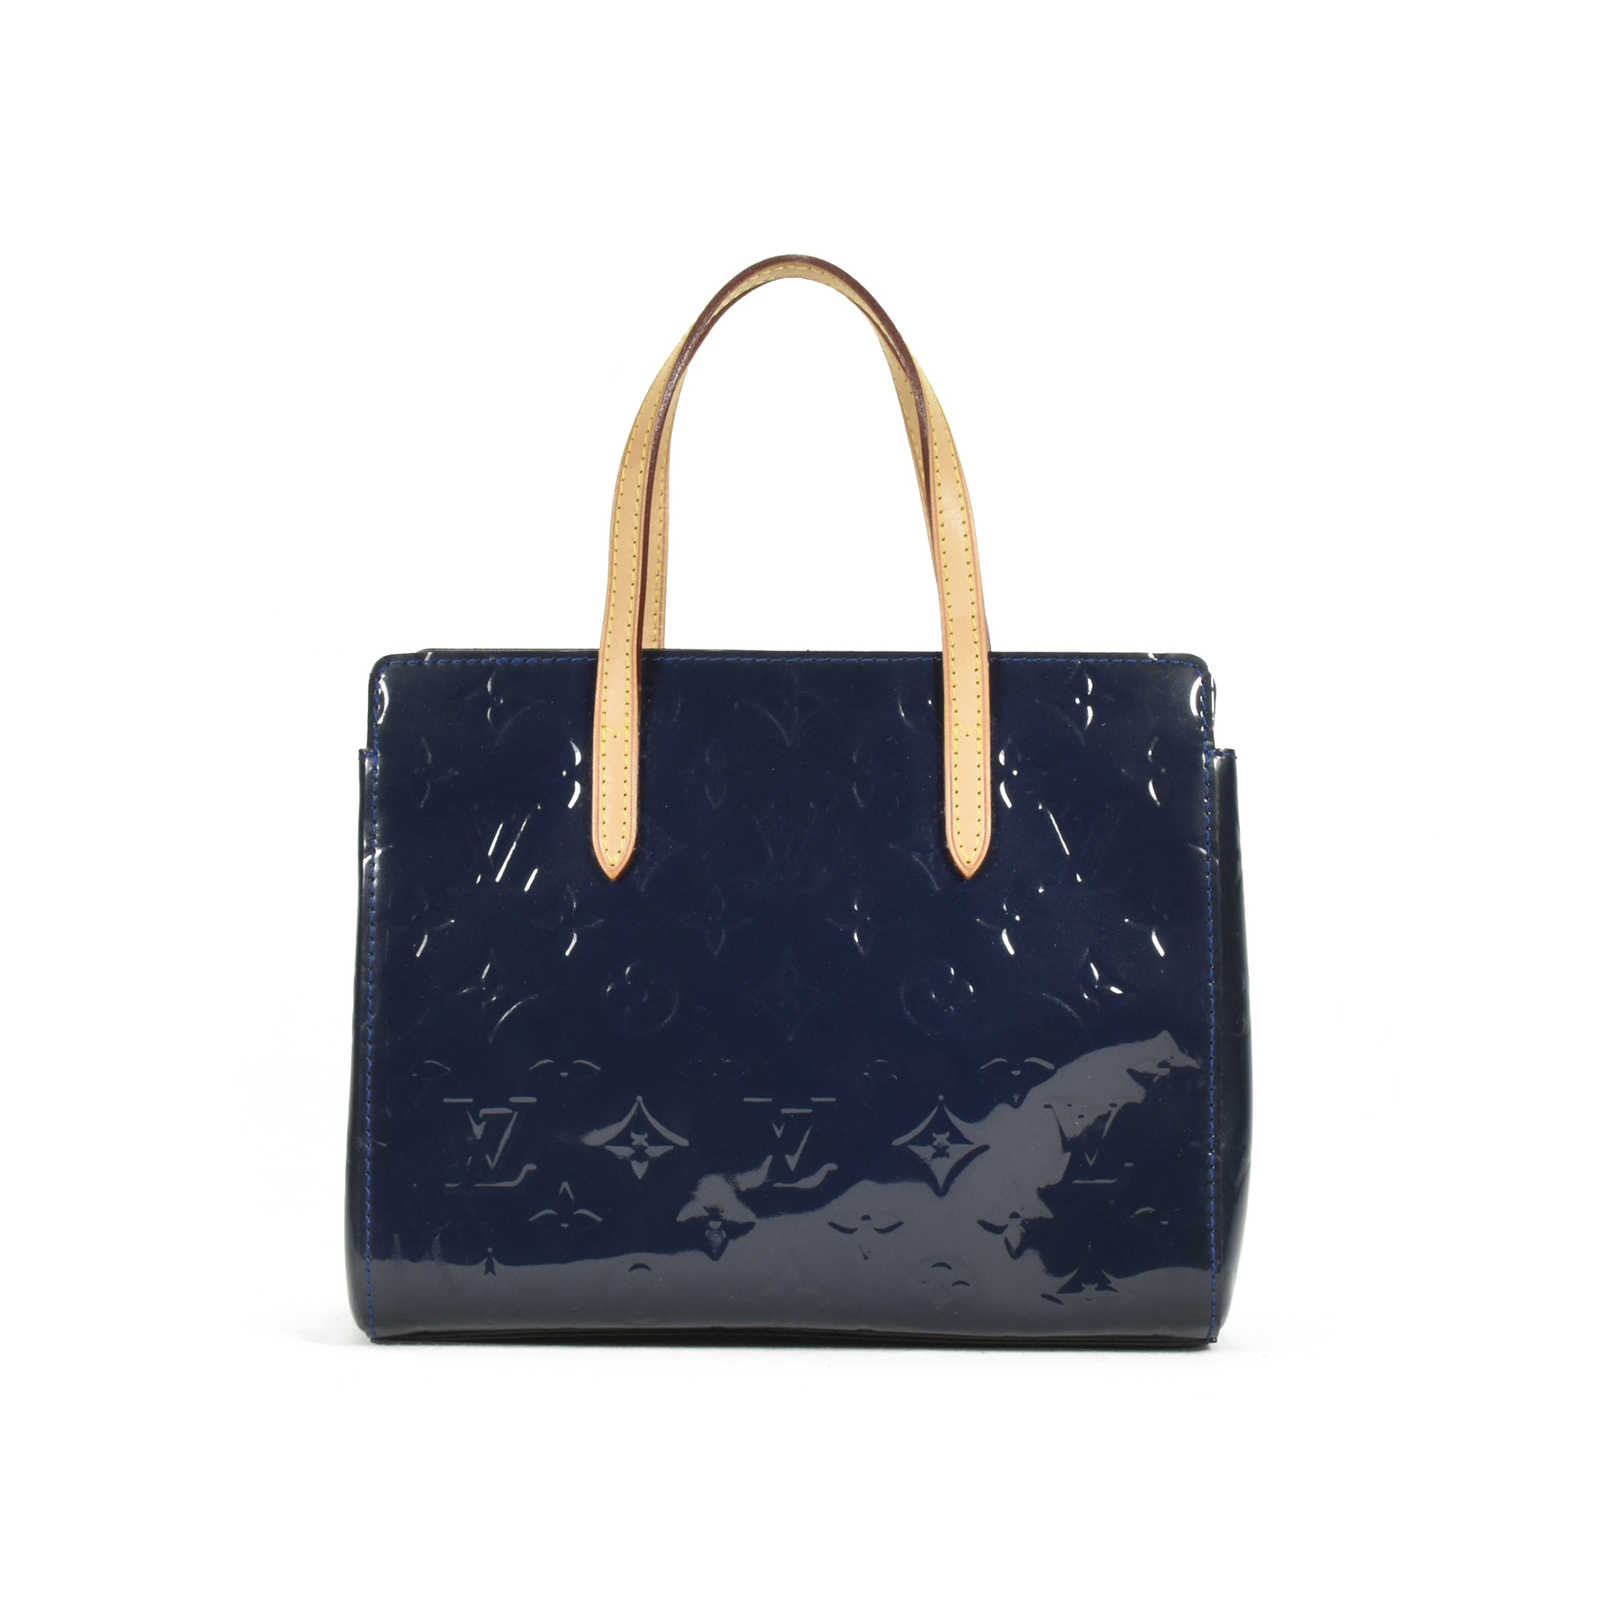 a3c0e1abfe952 ... Authentic Second Hand Louis Vuitton Monogram Vernis Catalina Bag  (PSS-394-00005) ...